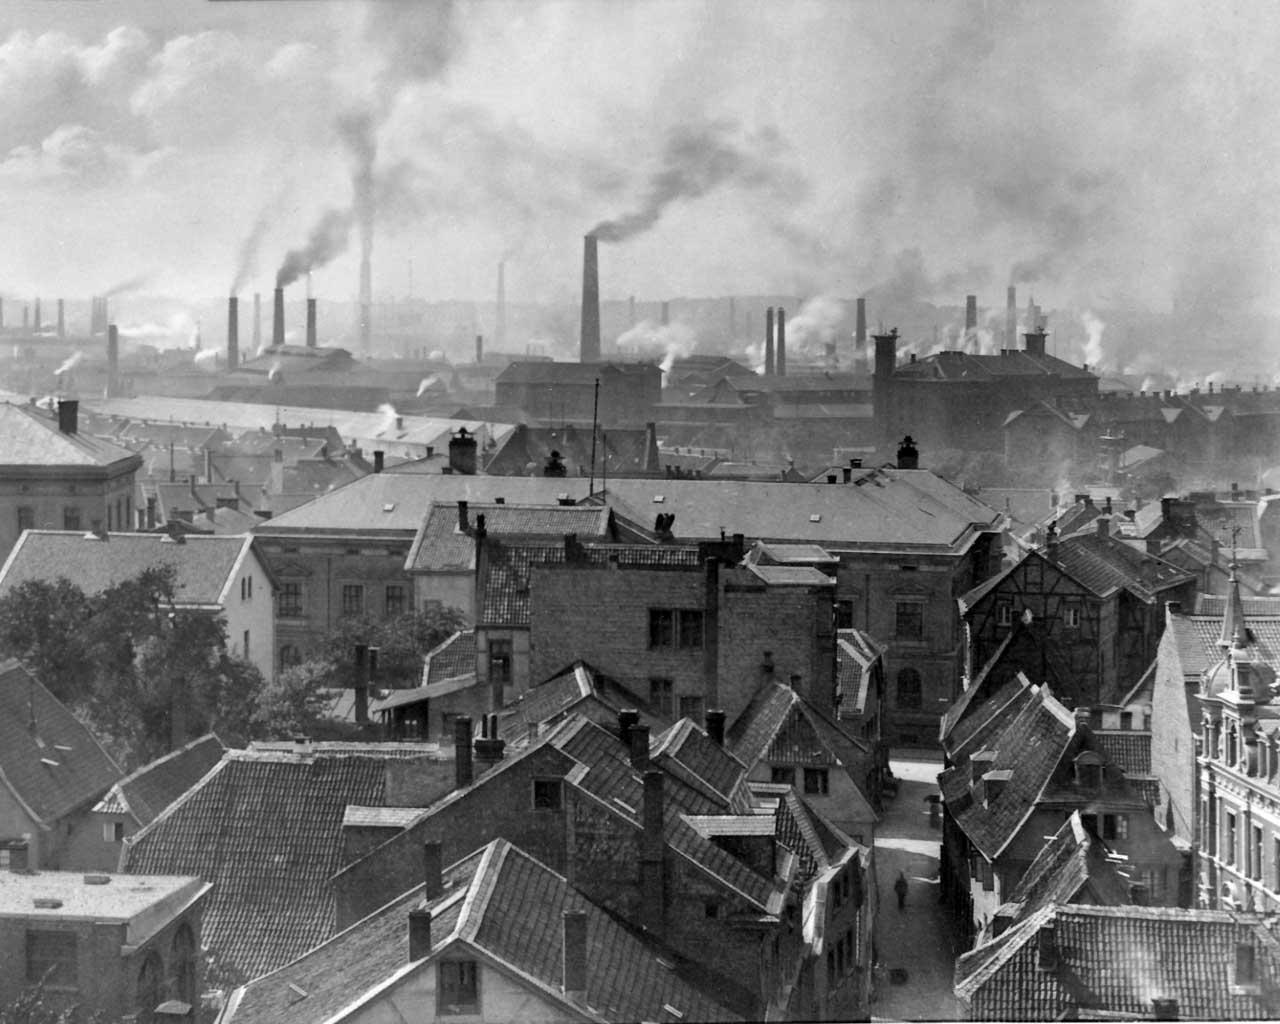 Fábricas de Krupp en Essen, ca. 1890.